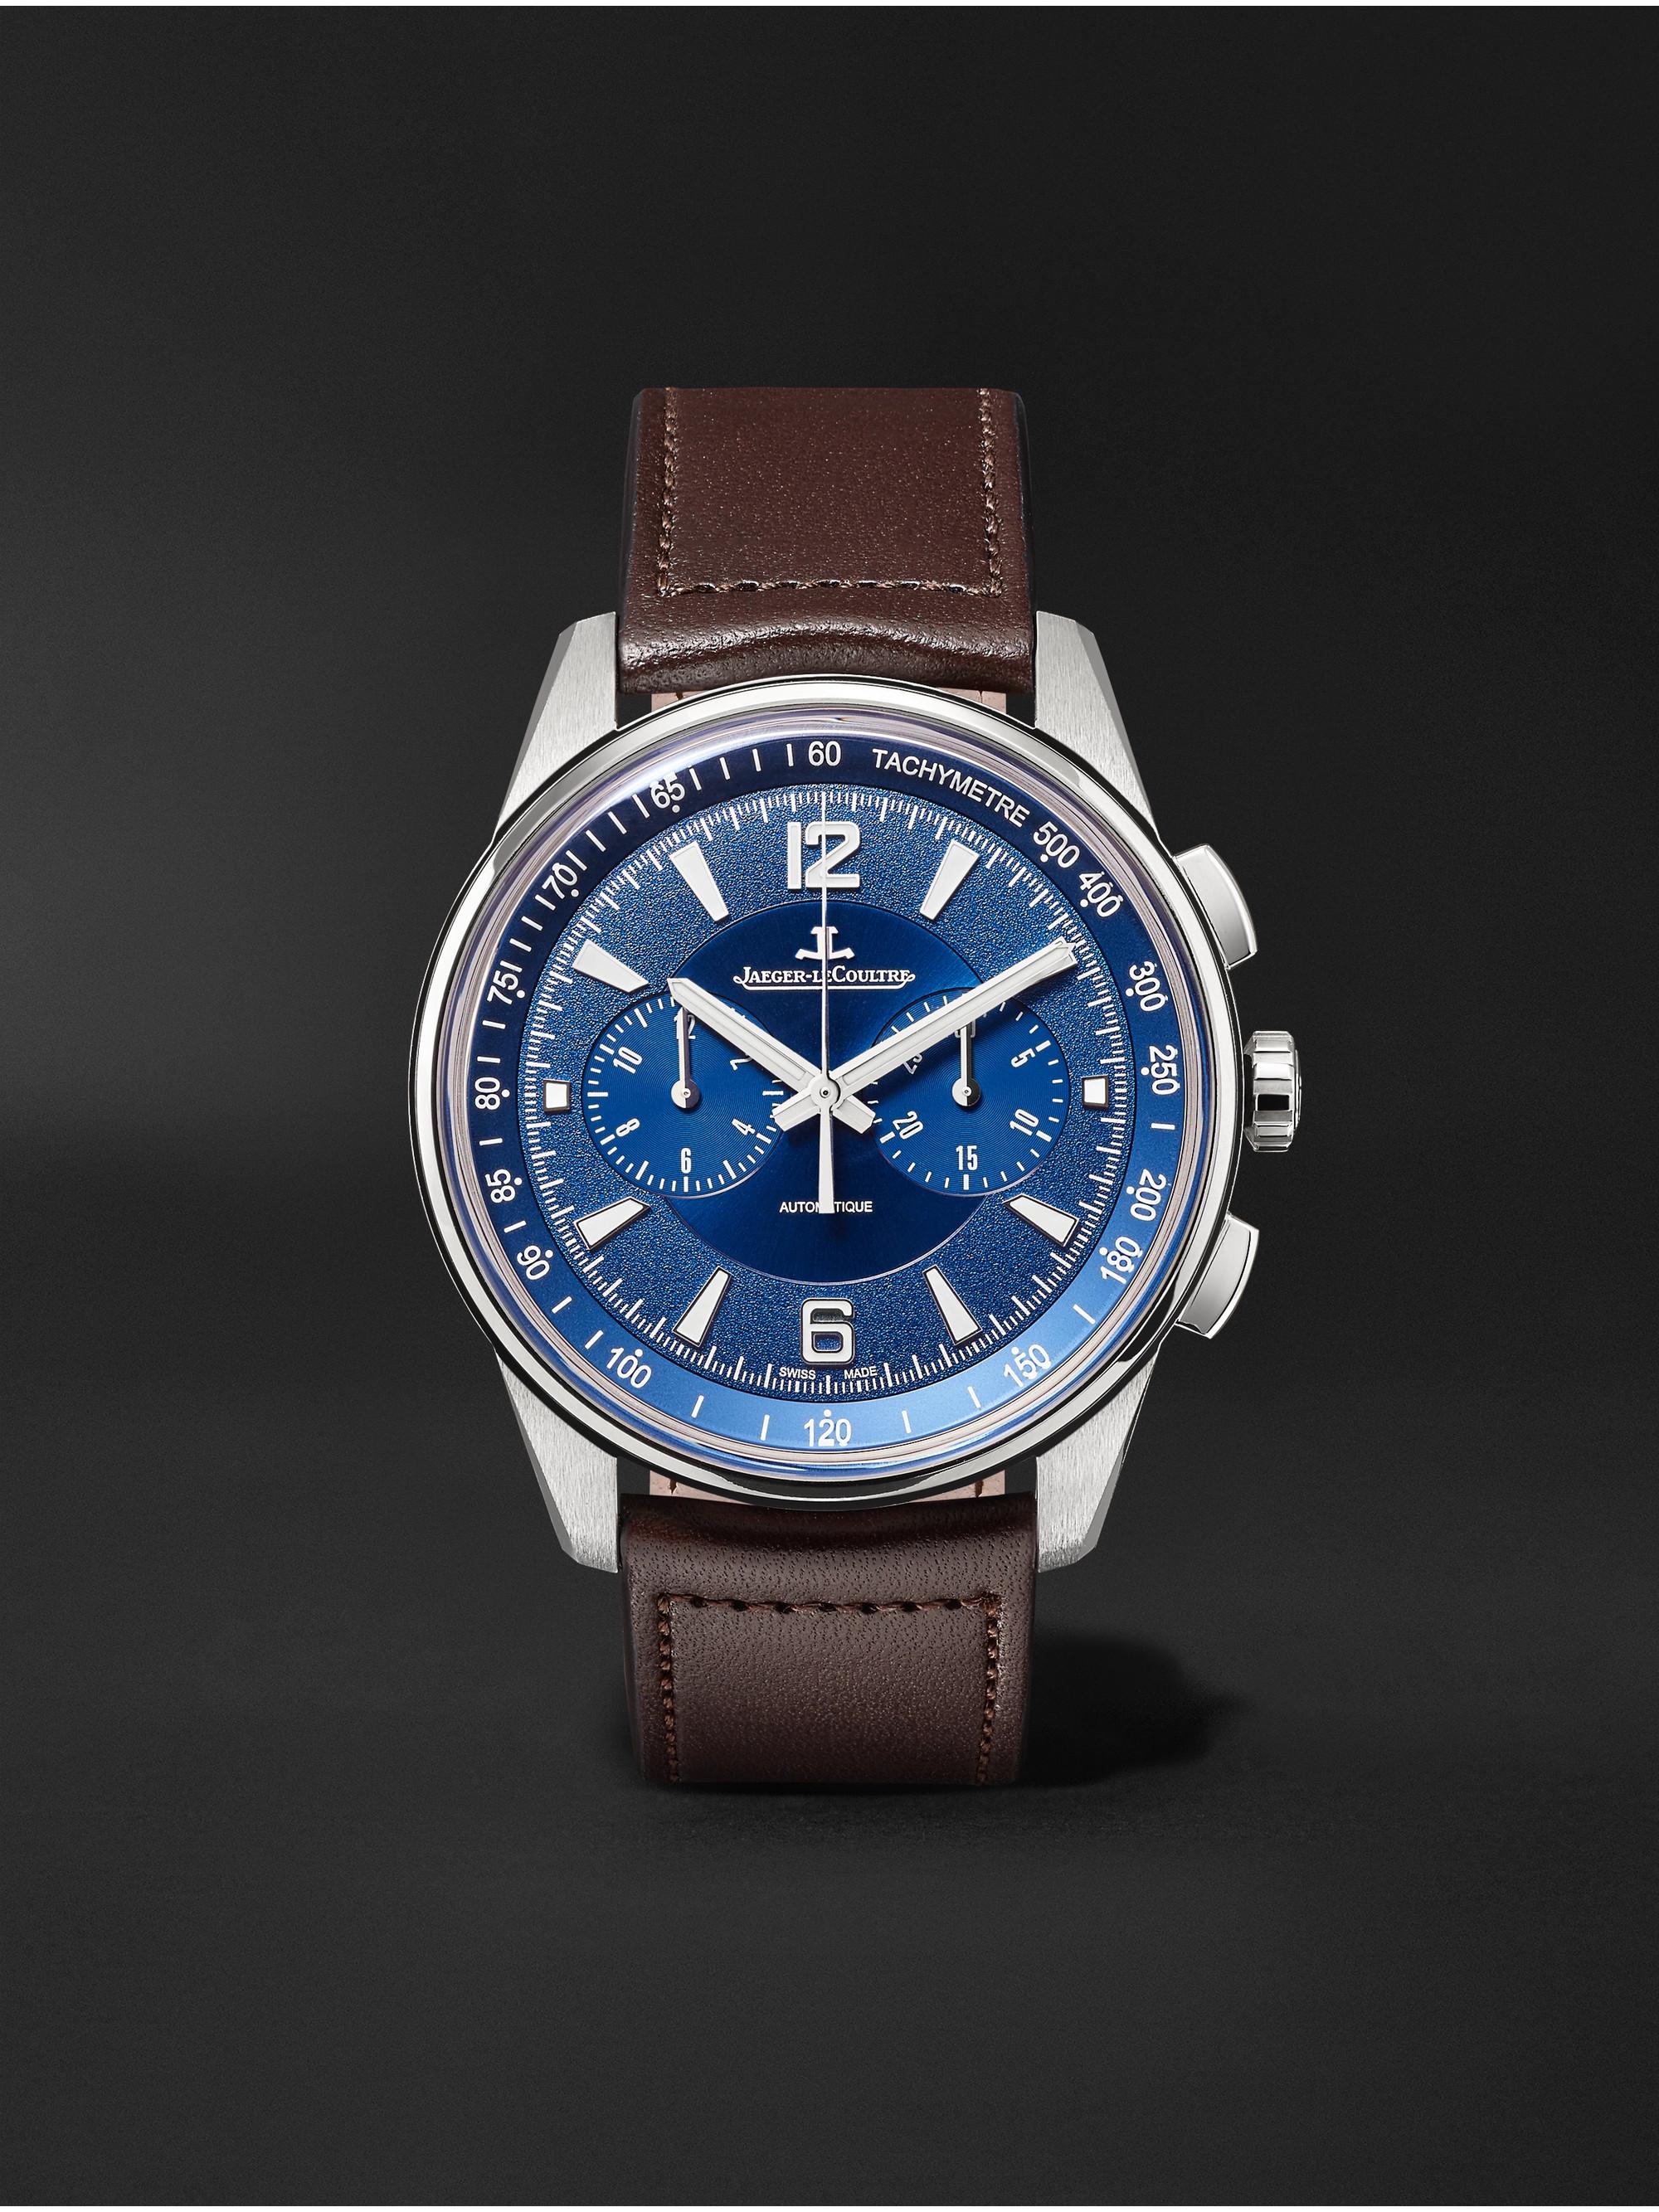 Jaeger-LeCoultre Polaris Automatic Chronograph Ref. No. 9028480